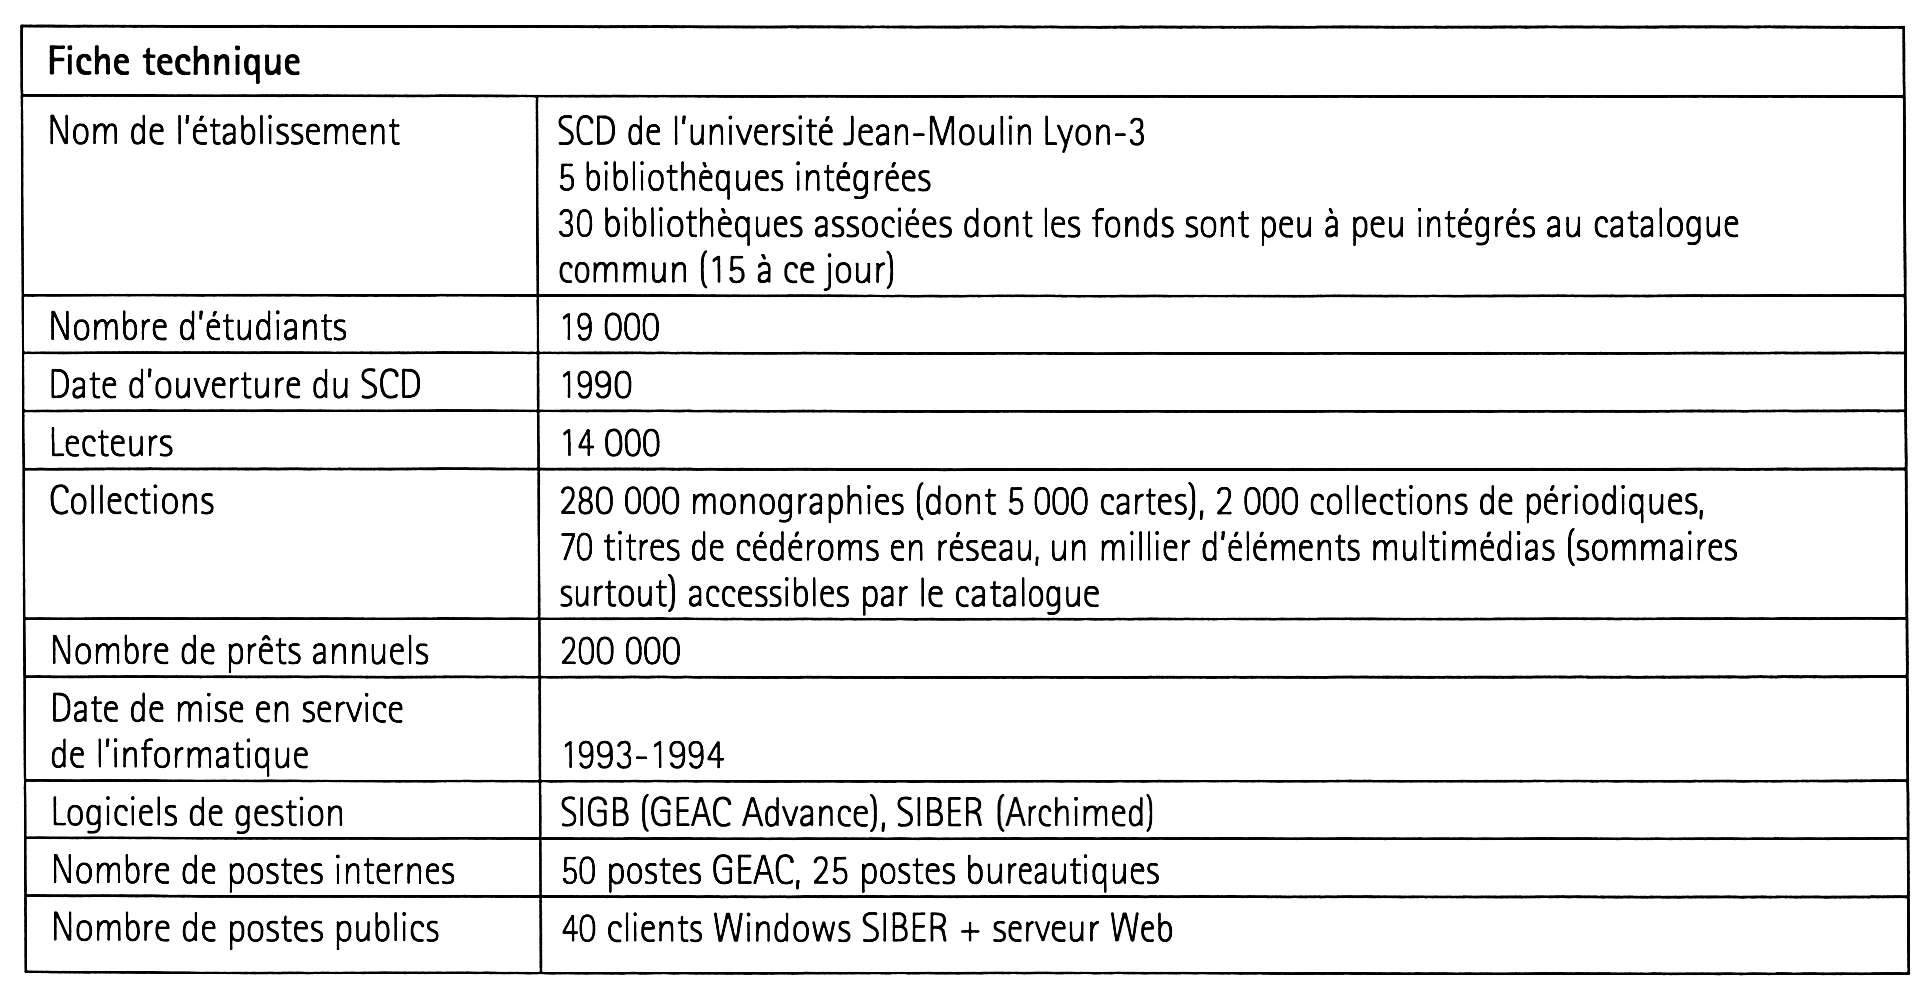 usages d 39 intranet au scd lyon 3 notice bibliographique. Black Bedroom Furniture Sets. Home Design Ideas